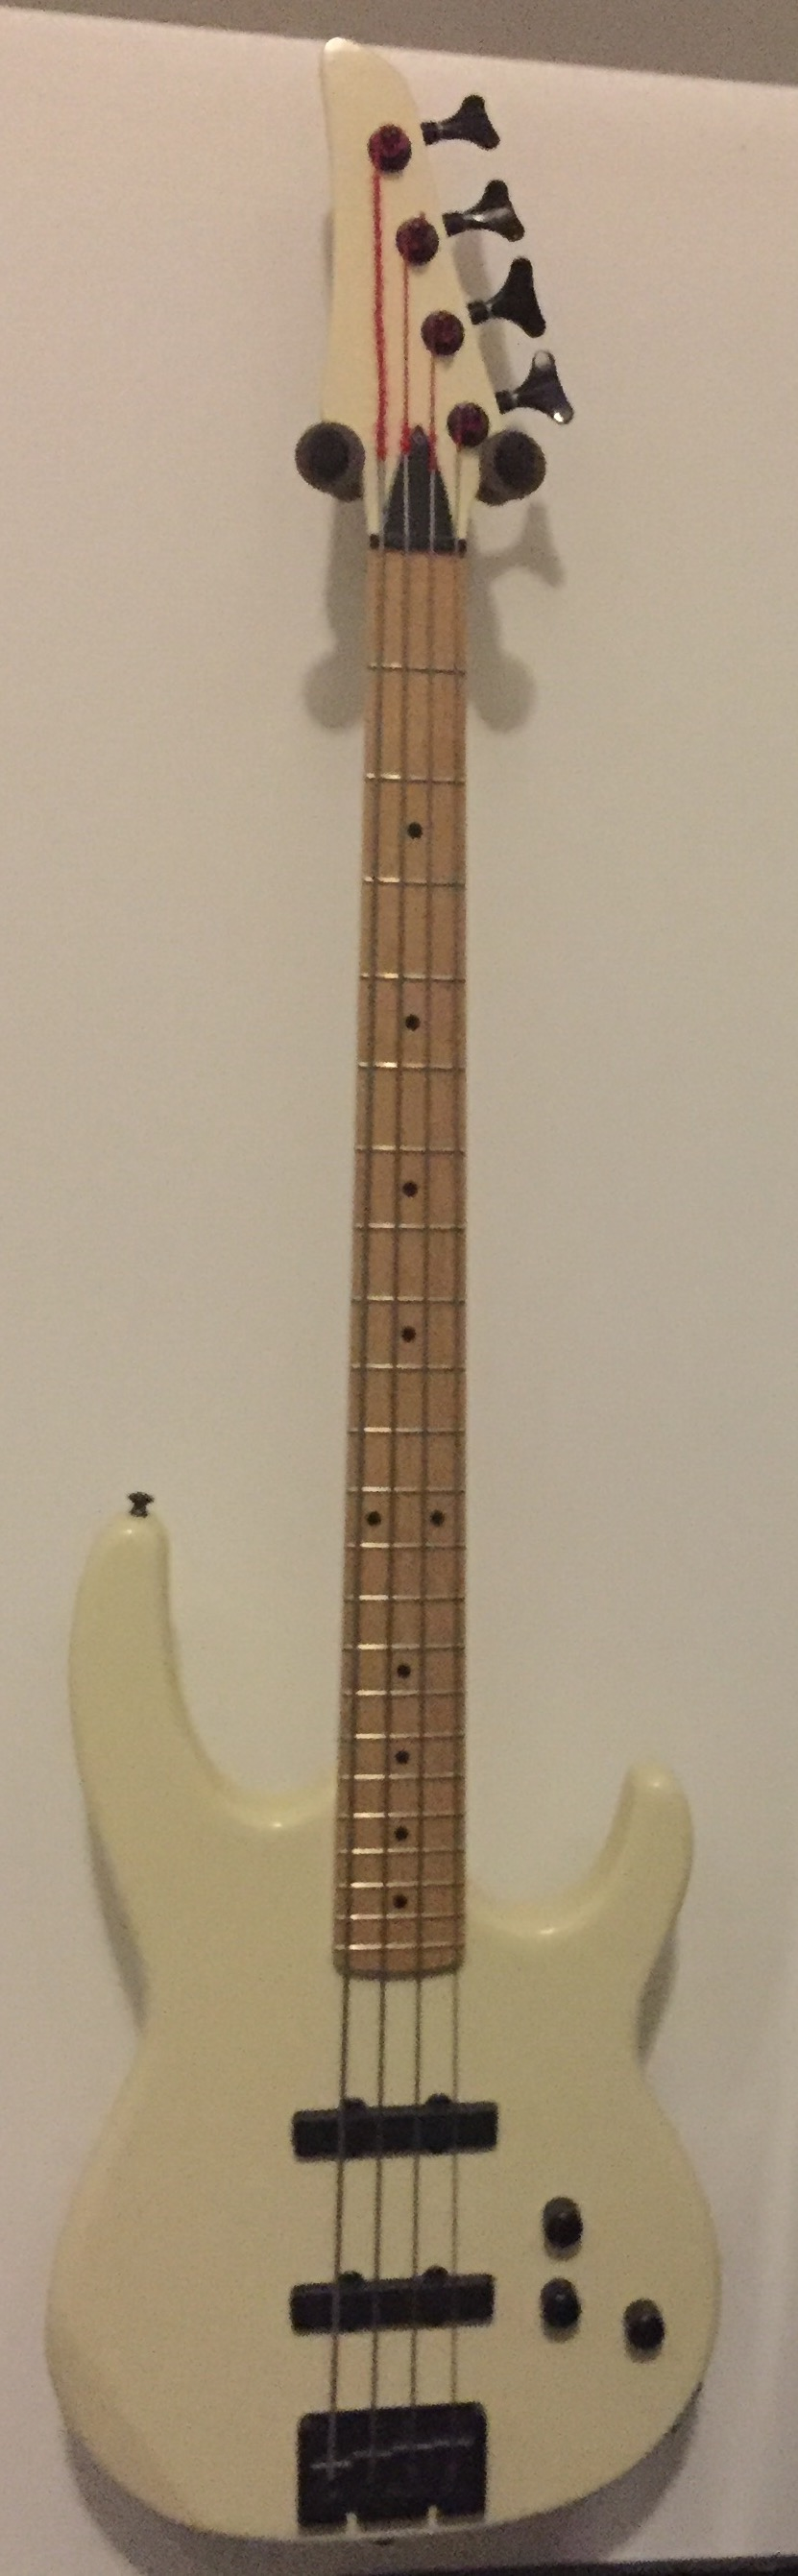 Carvin B4 Bass